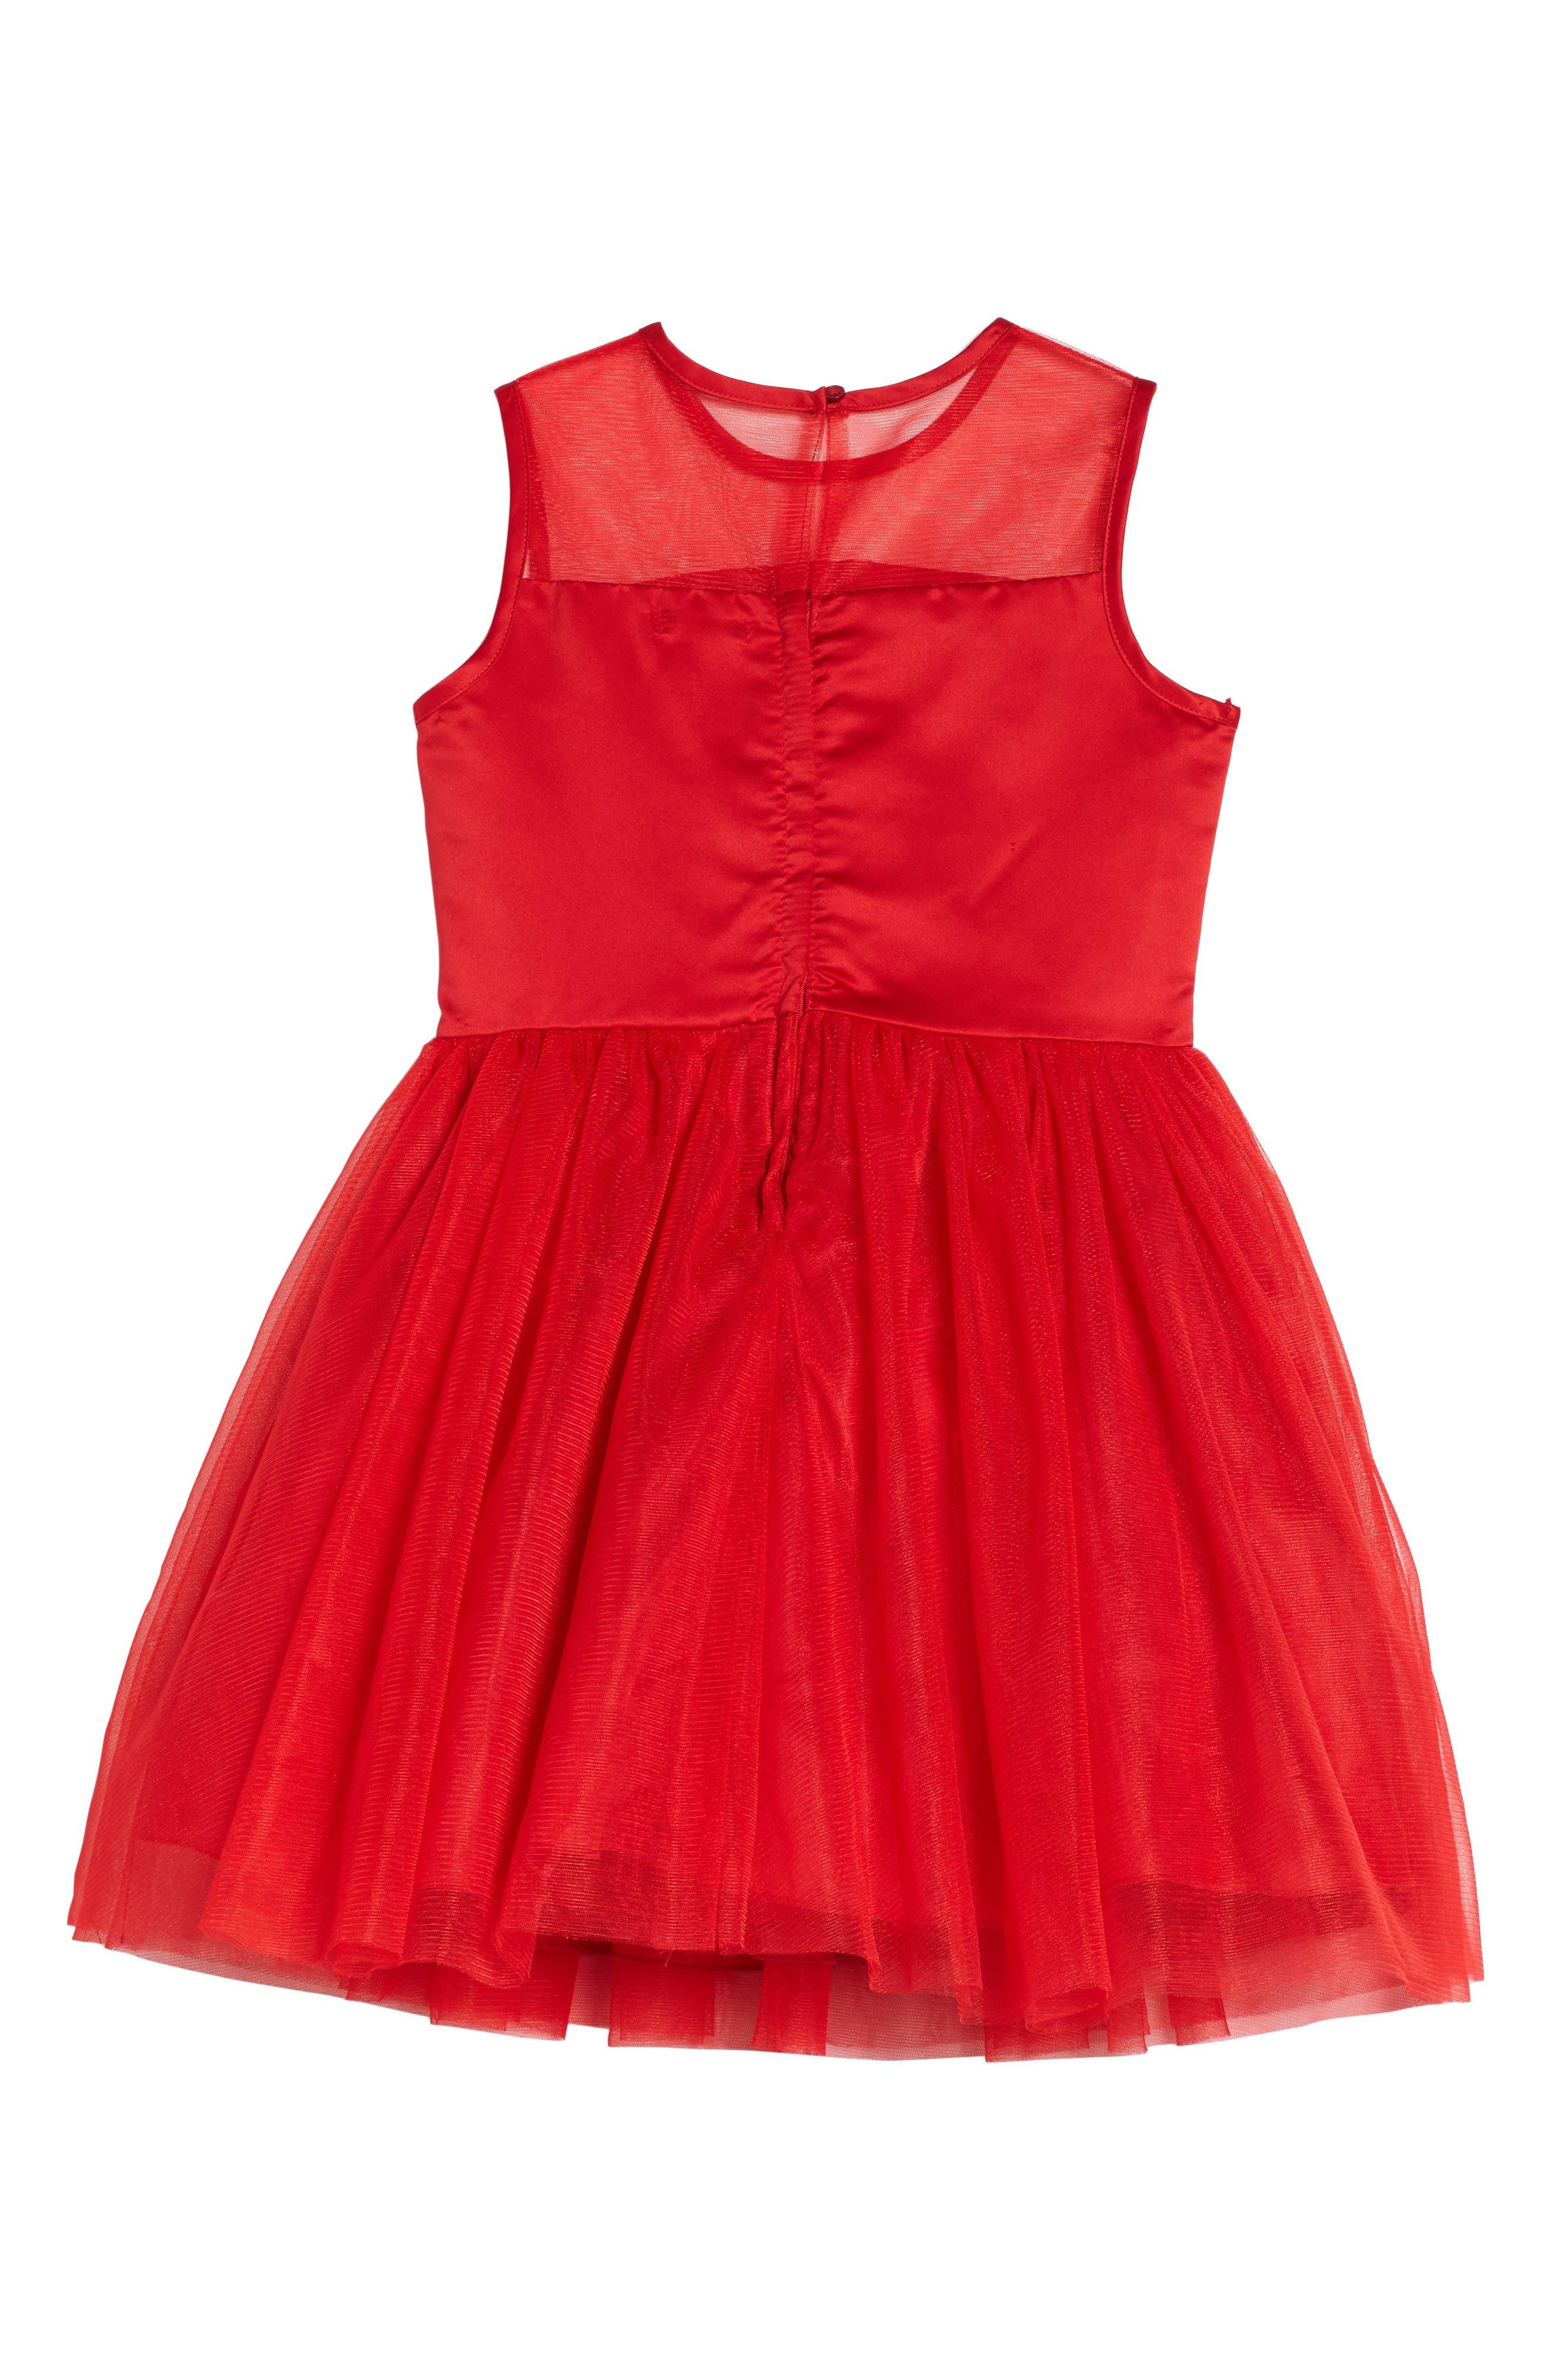 Floral Embellished Sleeveless Dress,                             Alternate thumbnail 2, color,                             Red